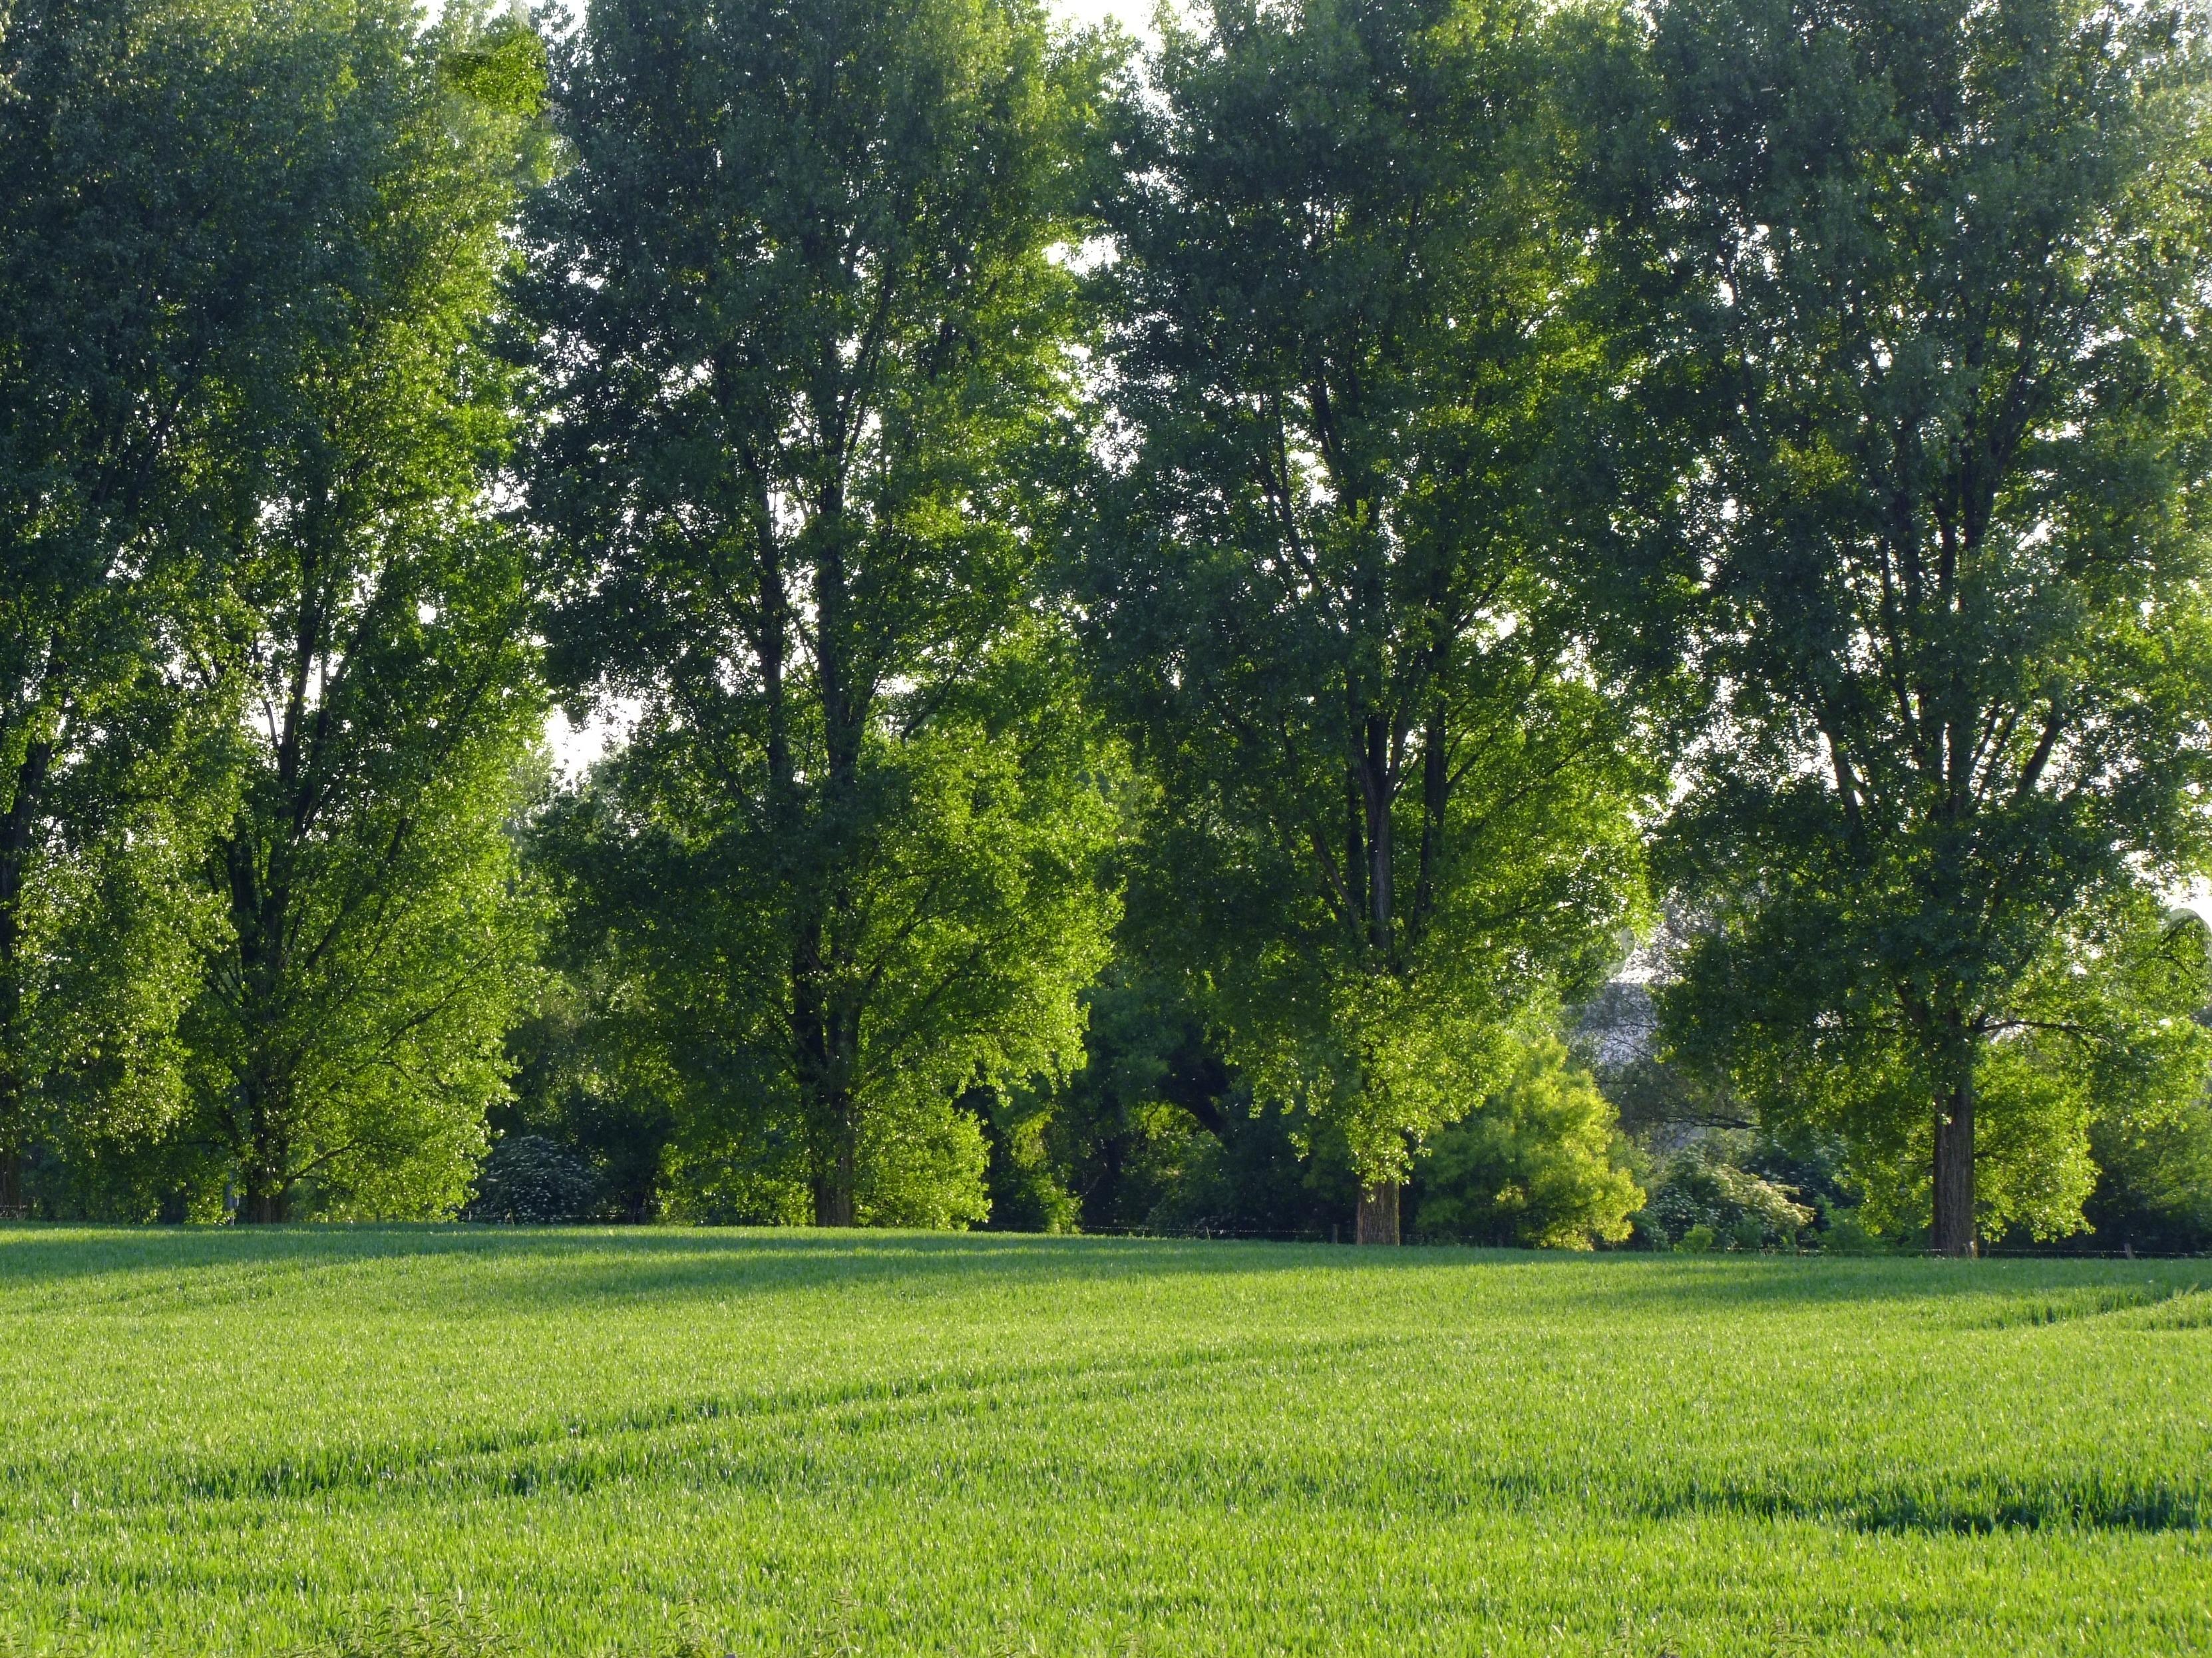 trees germany grass - photo #5